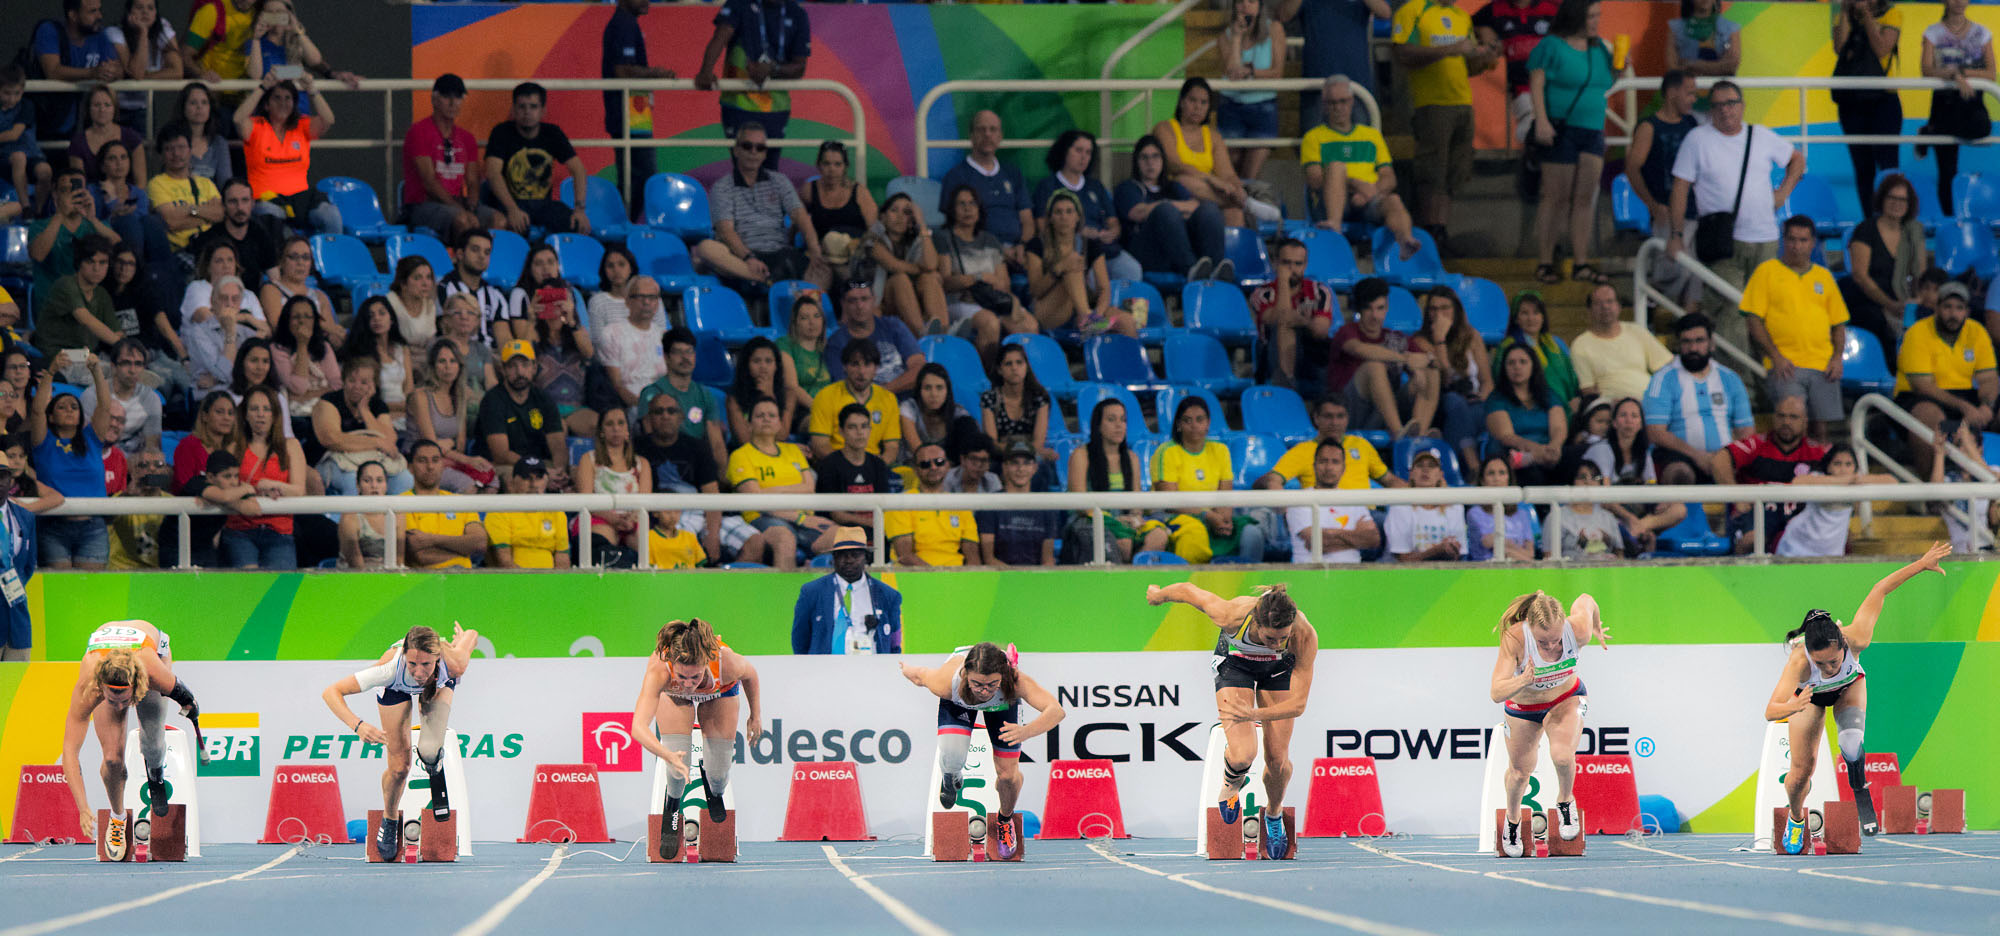 100m決勝のスタート直後(一番右が高桑早生)=リオパラリンピック(撮影:越智貴雄)